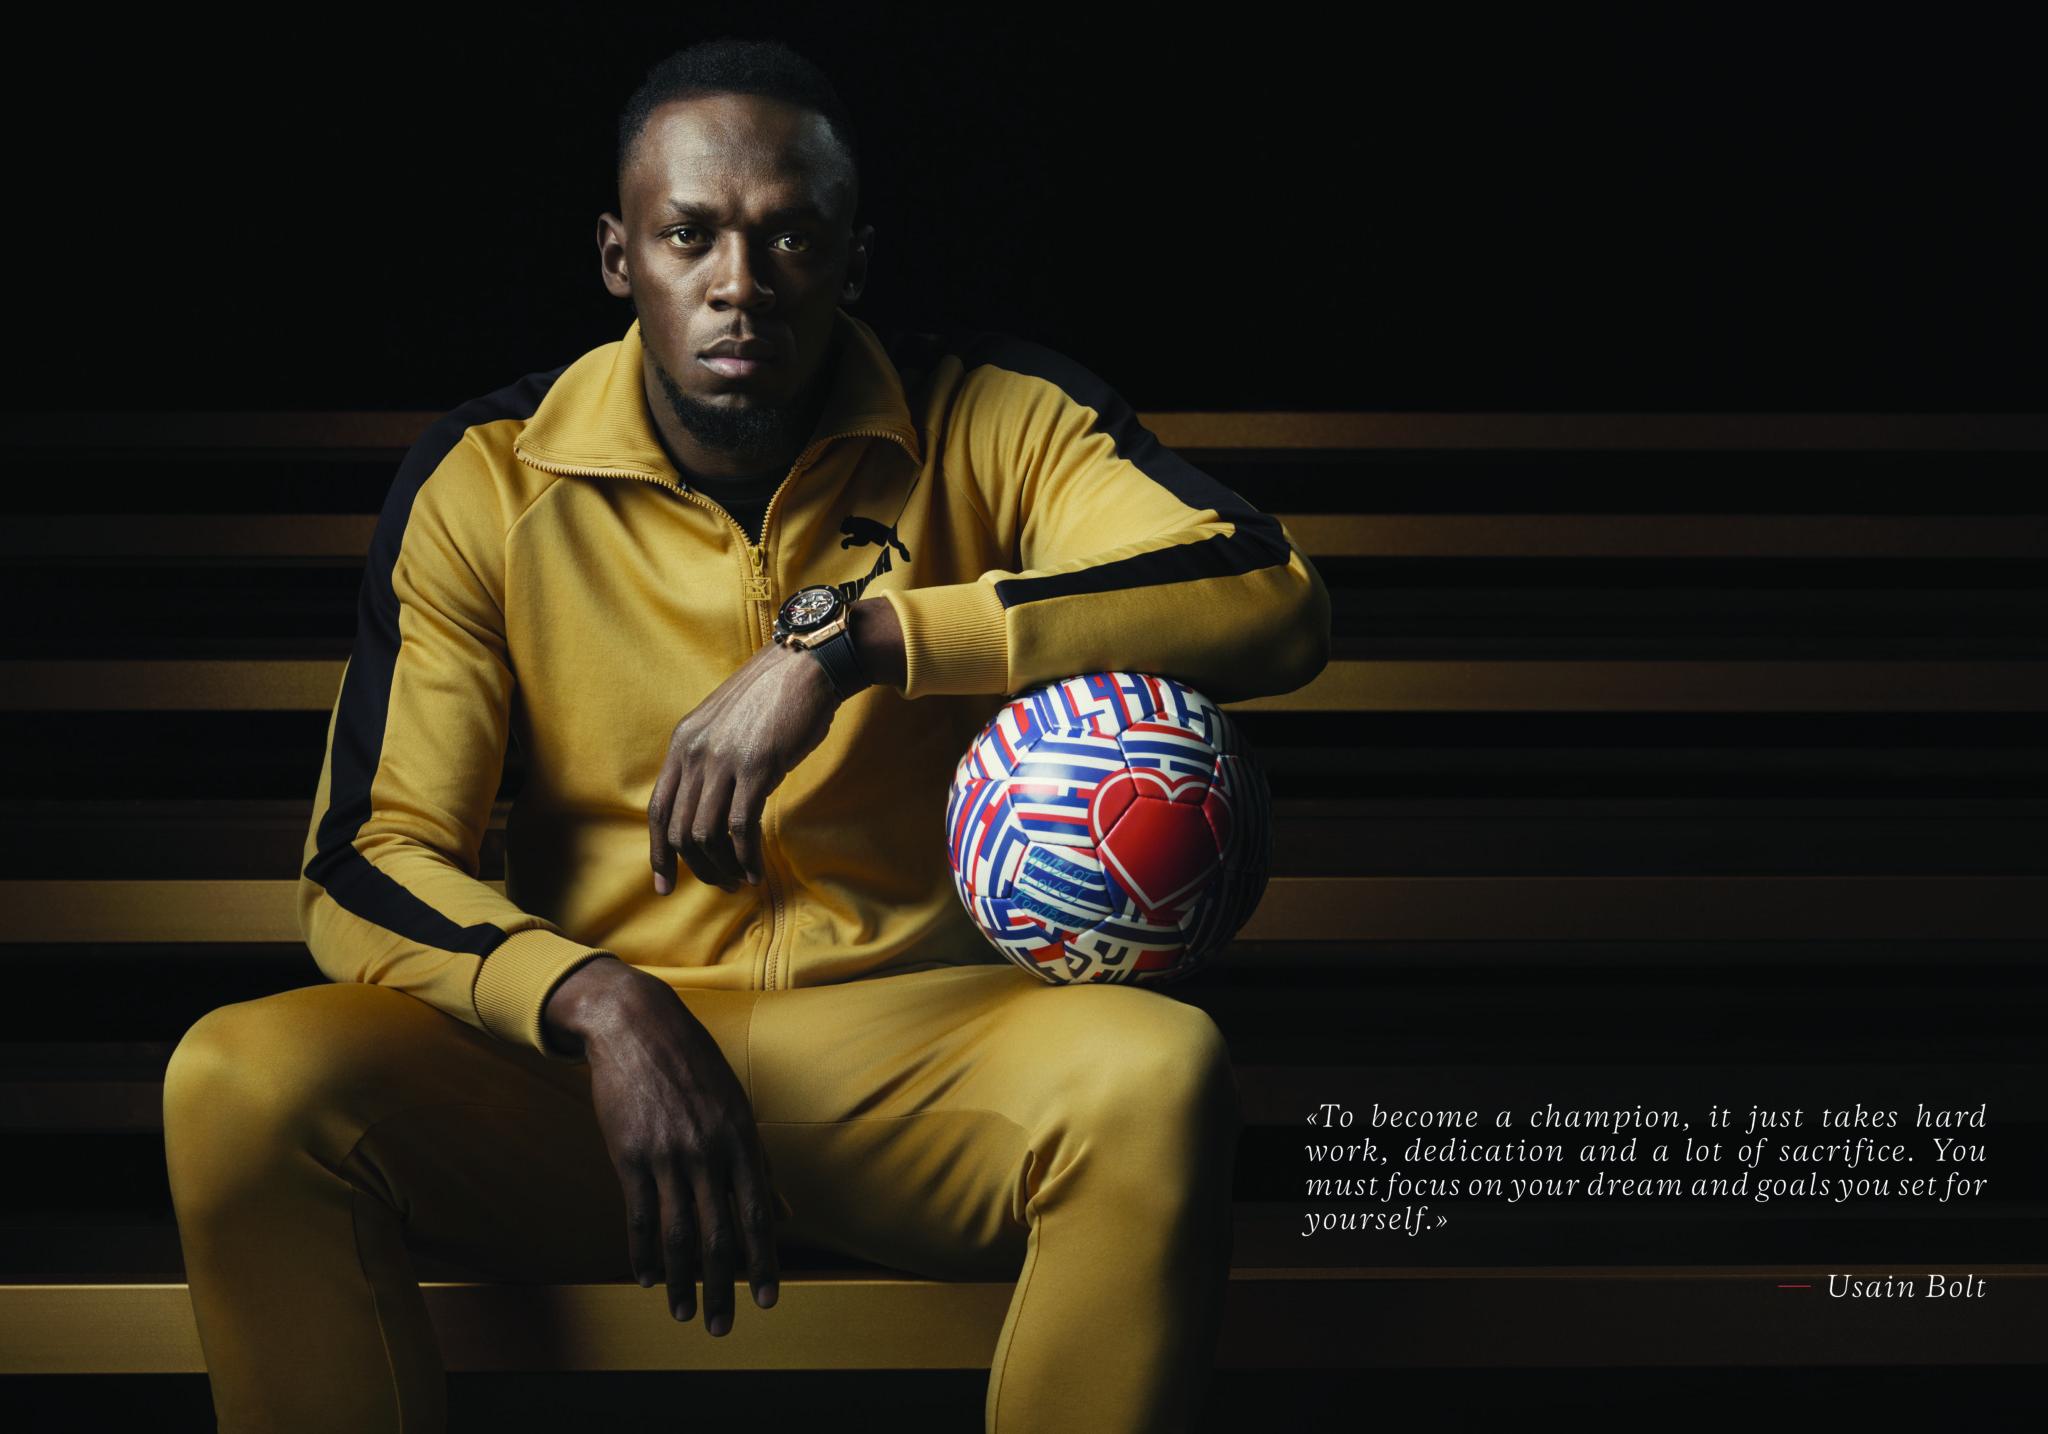 Hublot Ambassador Usain Bolt – Champion advice